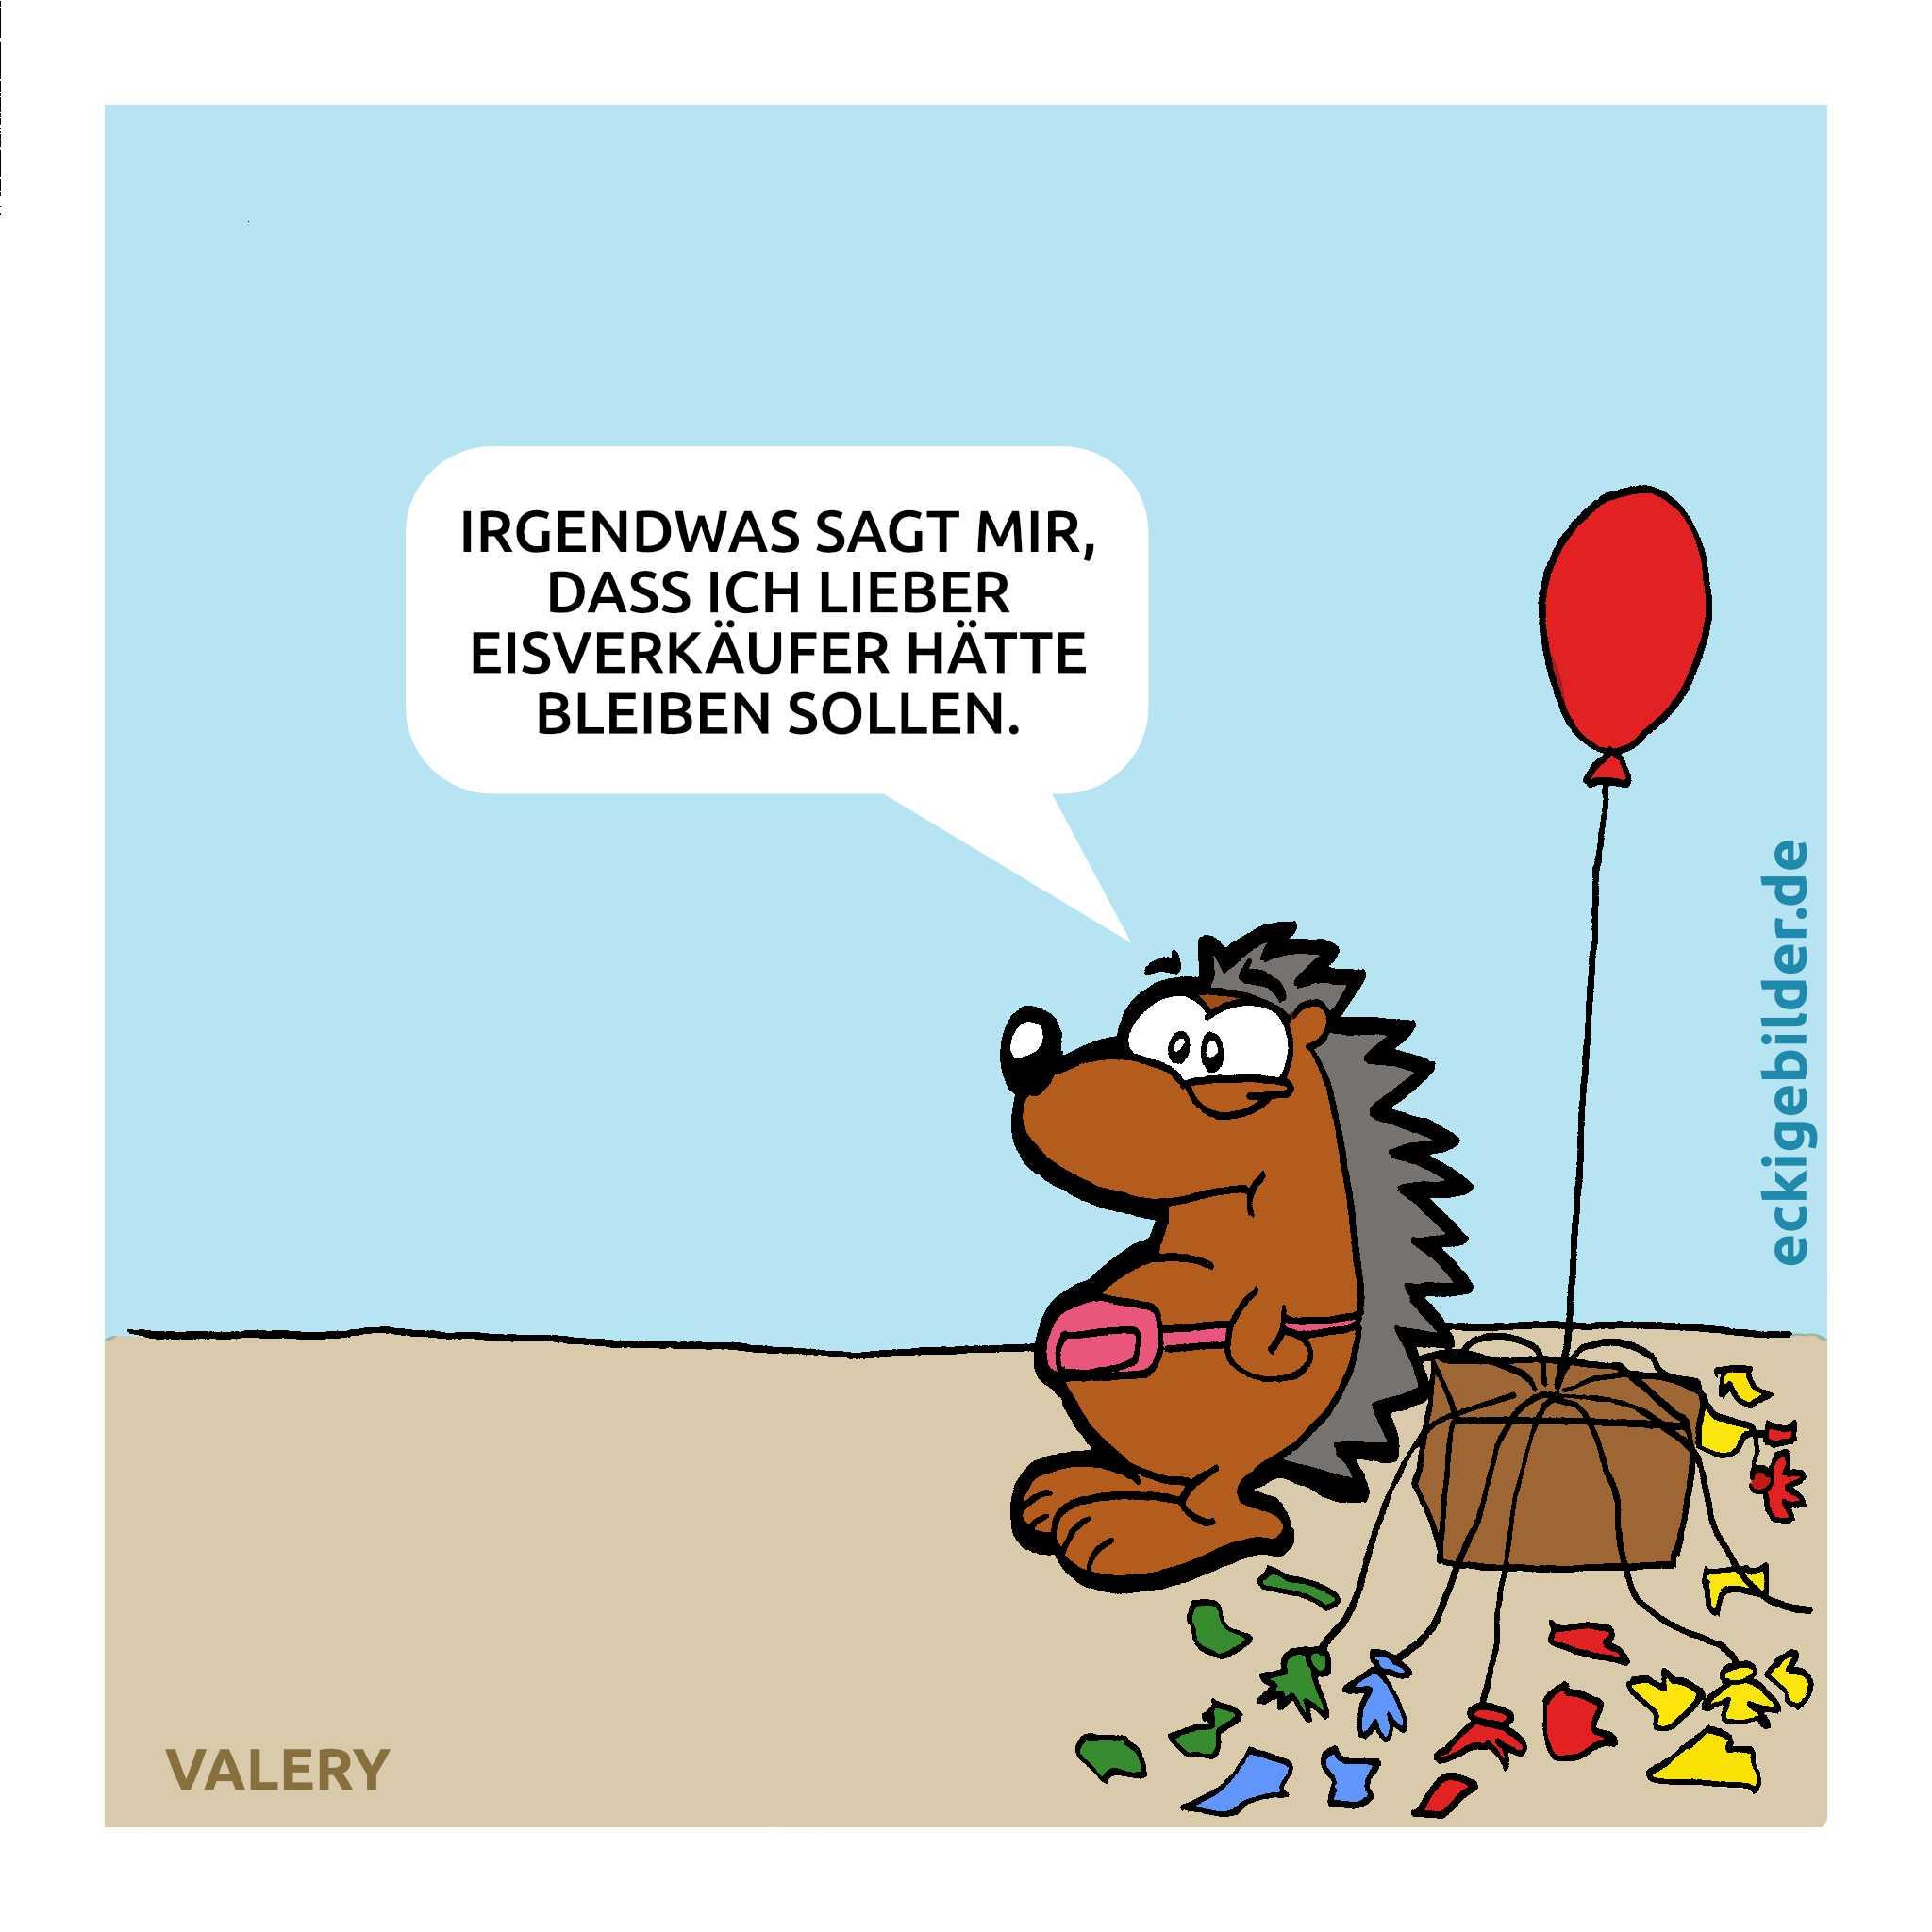 Igel Luftballonverkäufer/ Eisverkäufer Cartoon